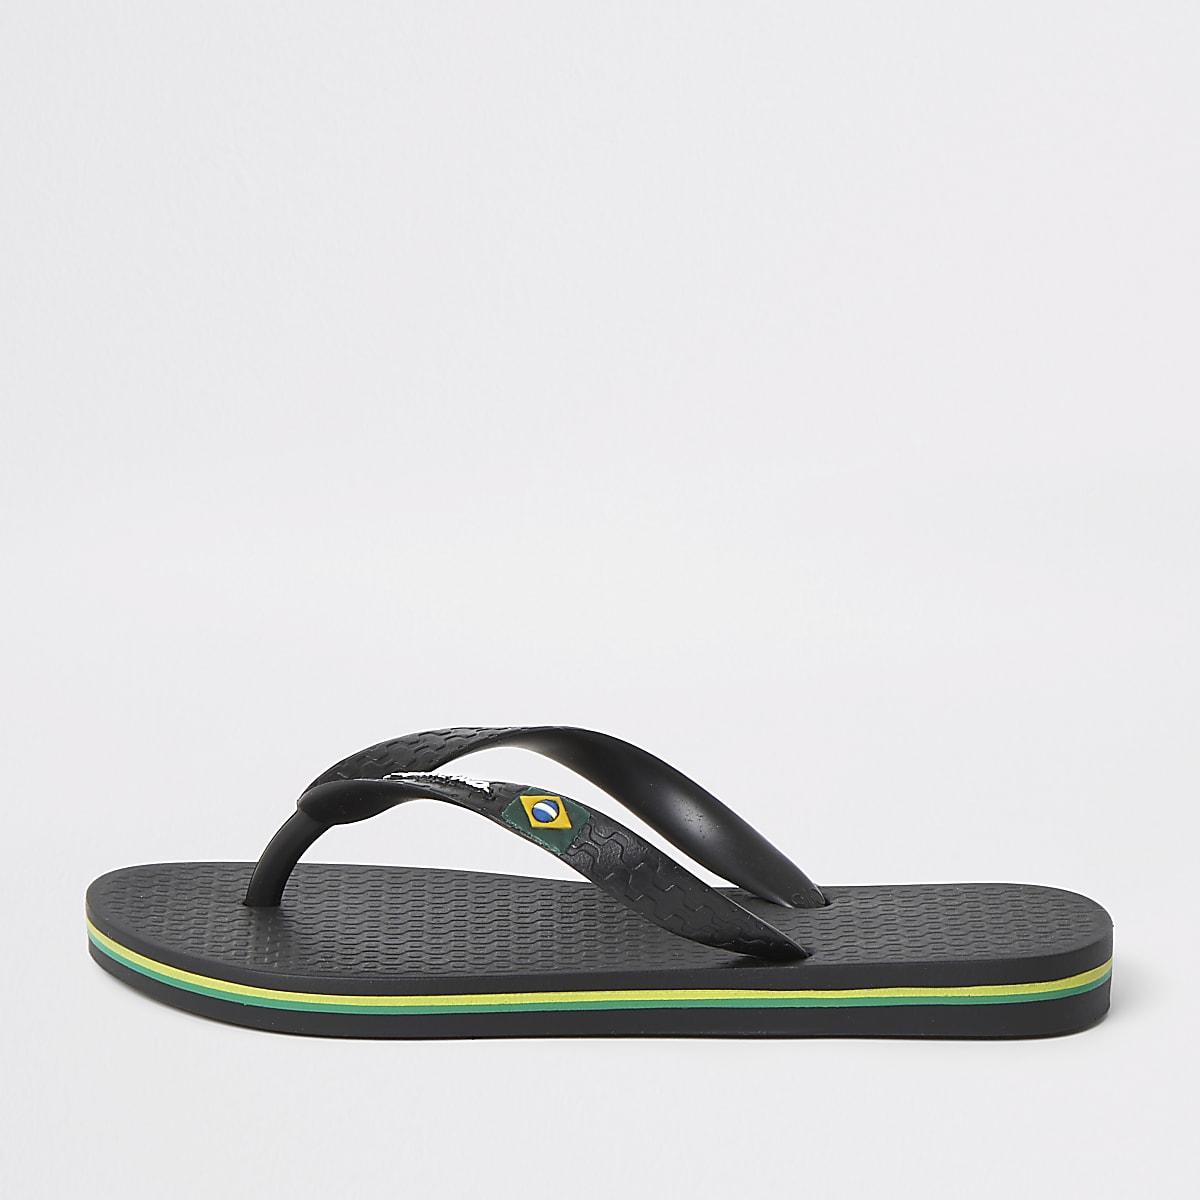 Boys Ipanema black Brazil flip flops